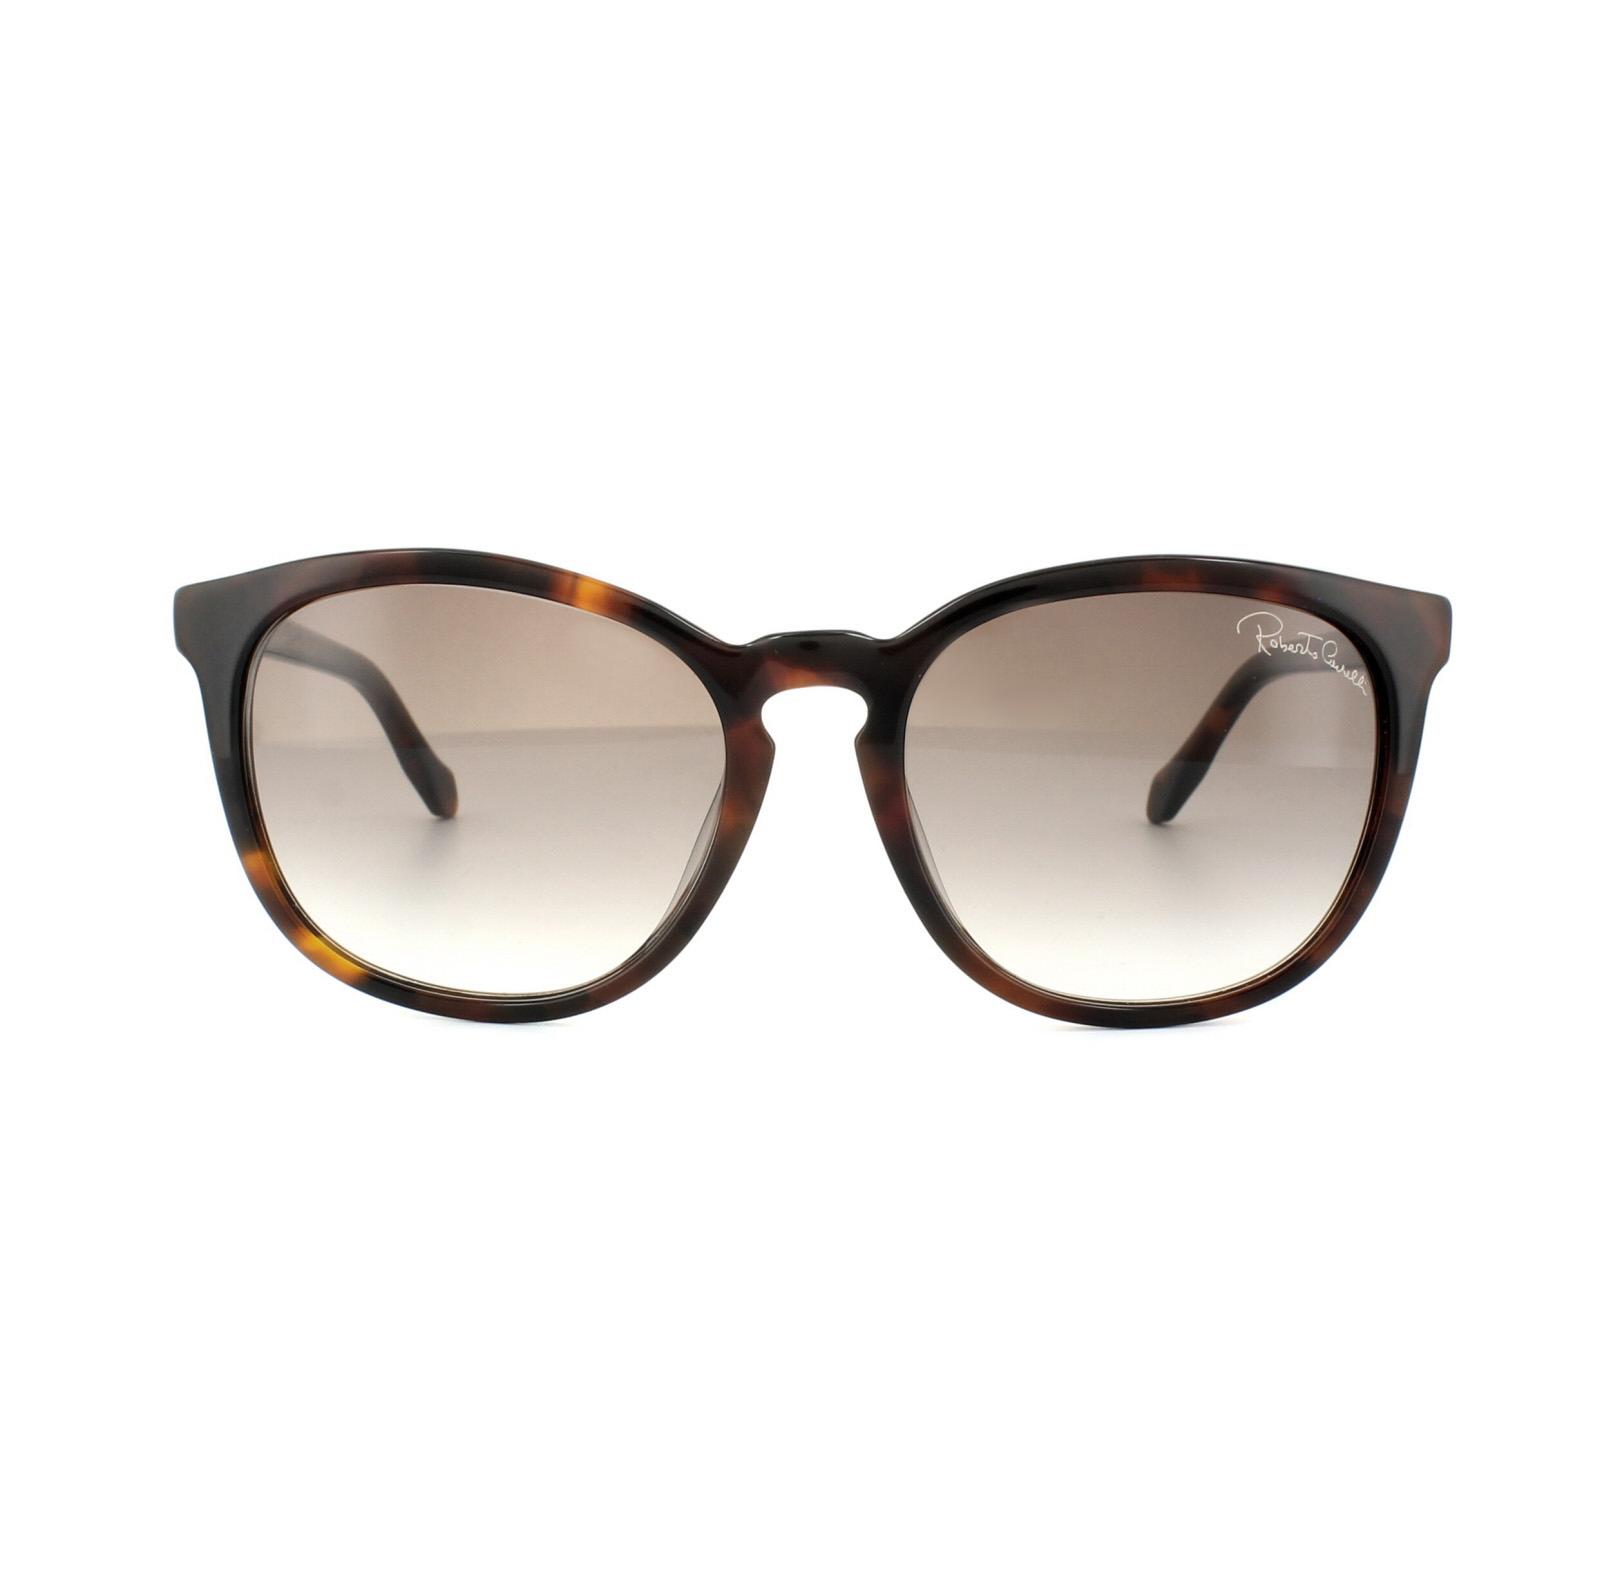 75a1650958125 CENTINELA Roberto Cavalli gafas de sol Zavijava 1019 52F Havana oscuro  marrón degradado